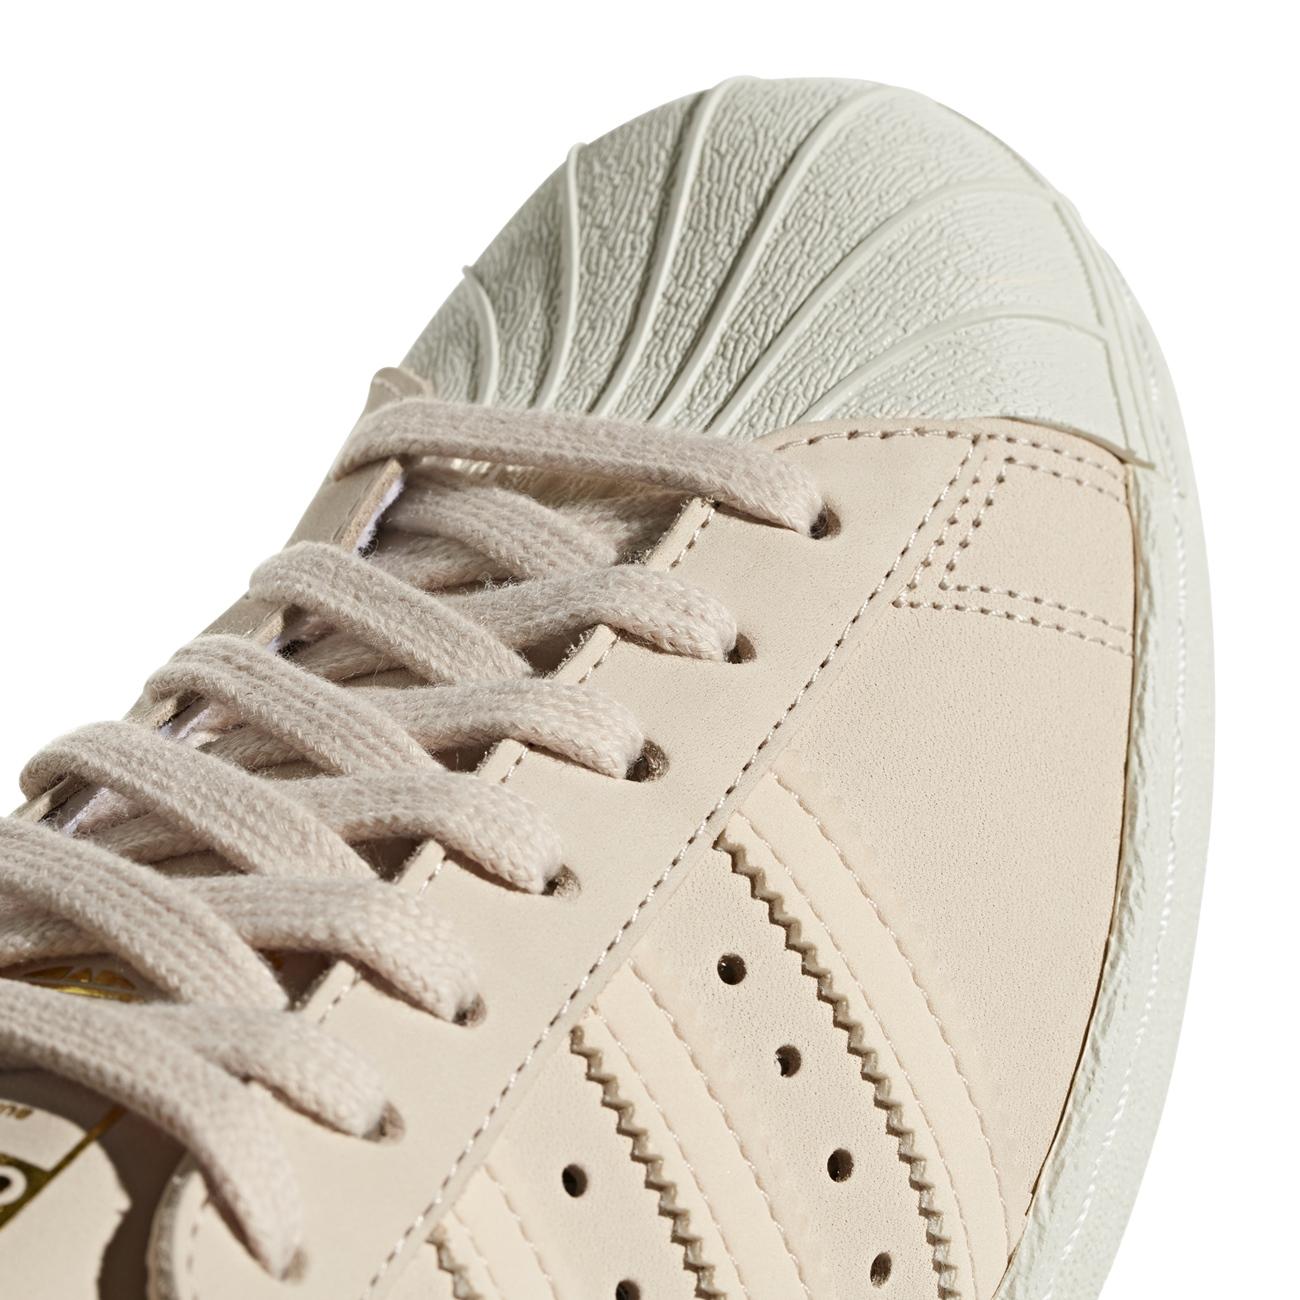 Adidas Originals Superstar Femmes Chaussure Blanc Linge Woman Old Sneaker... School Sneaker... Old be4309